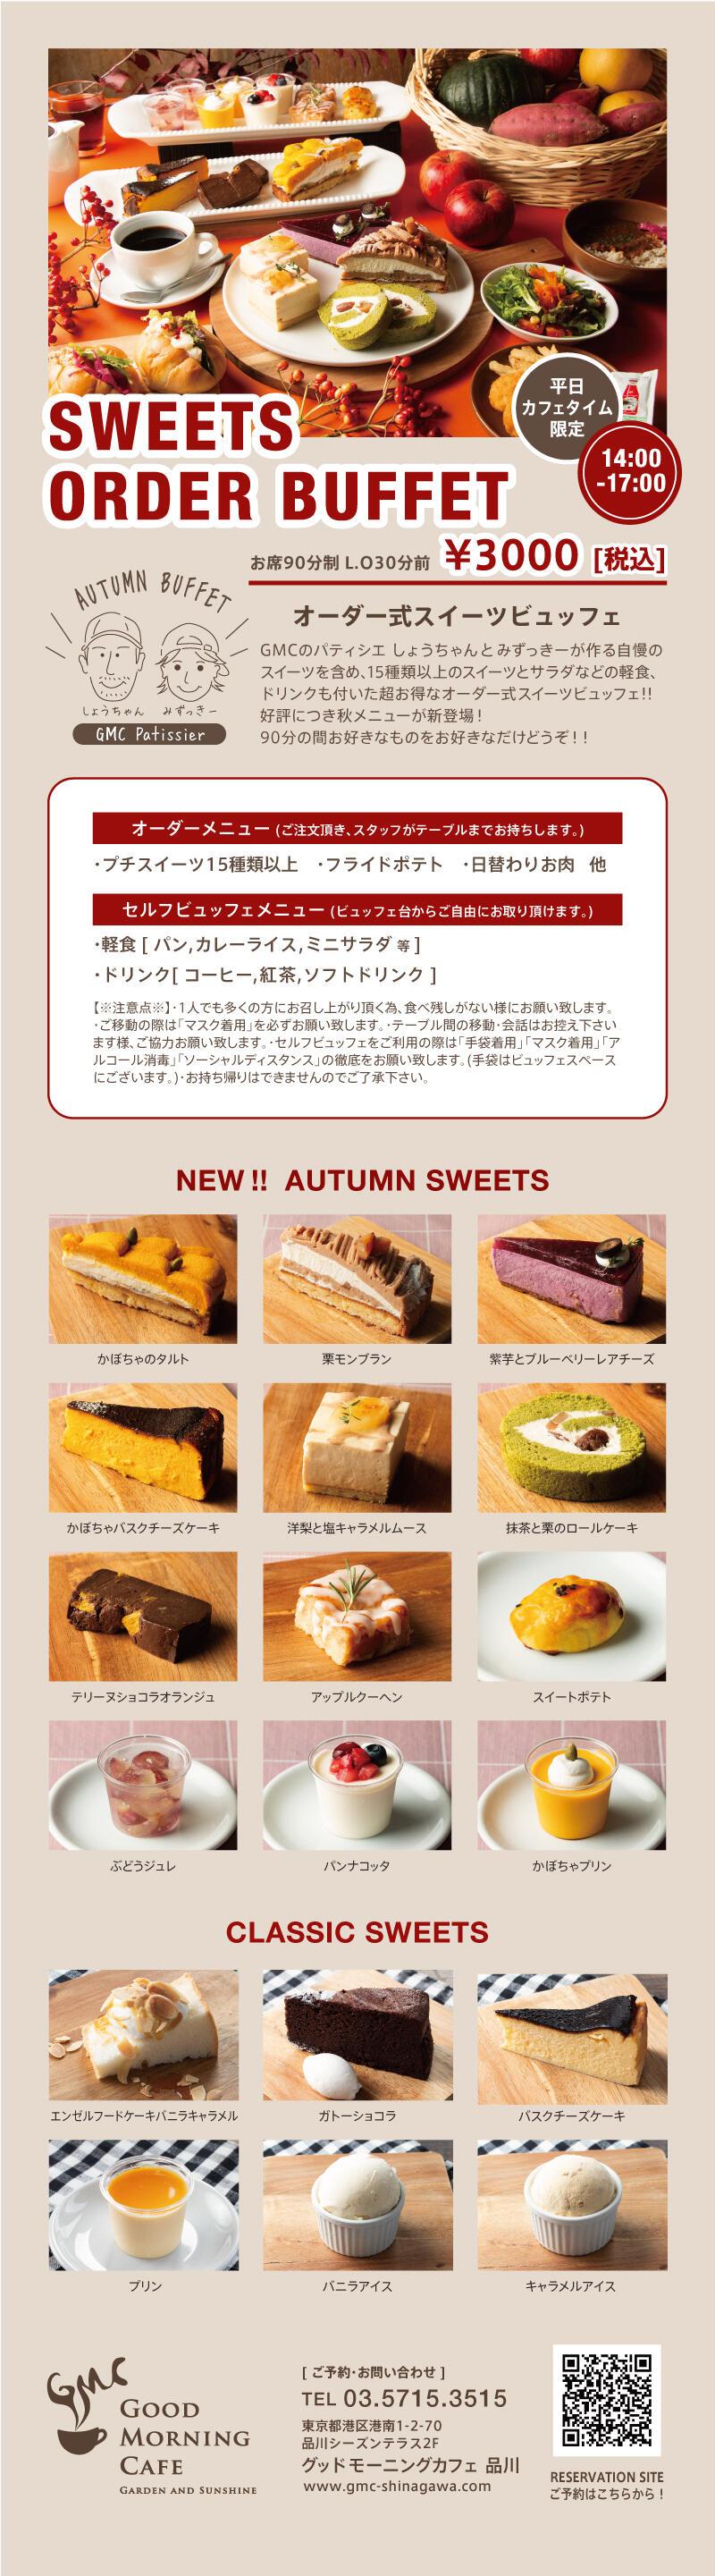 gmcsi_210913_sweetsbuffet_web_main.jpg